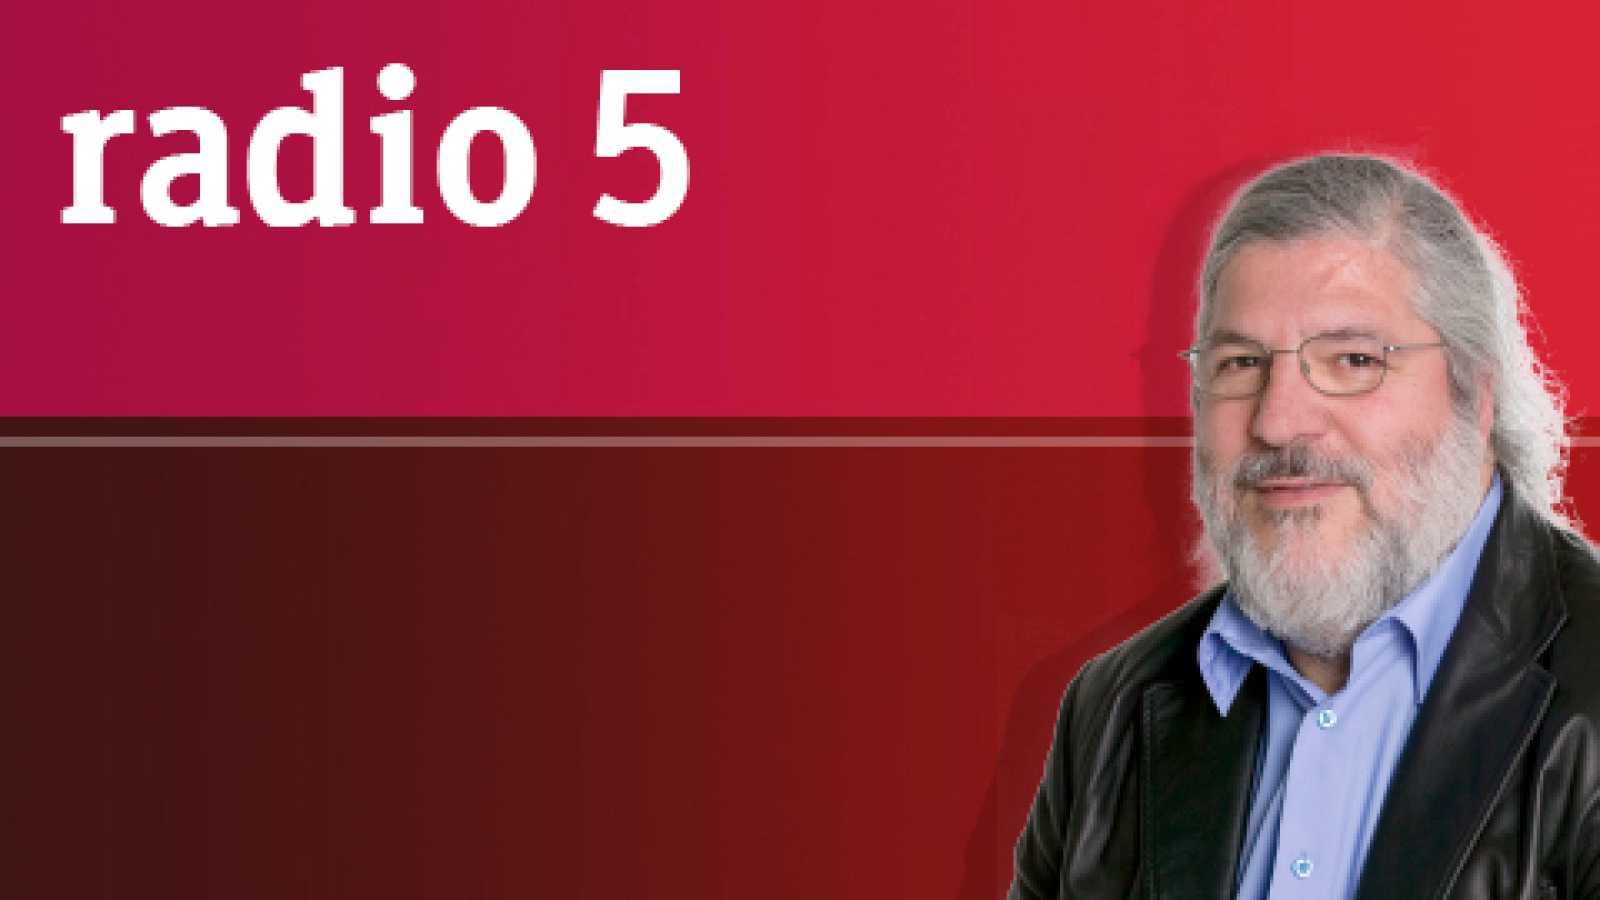 Flamenco en Radio 5 - Pepe Habichuela - segunda parte - 07/05/17